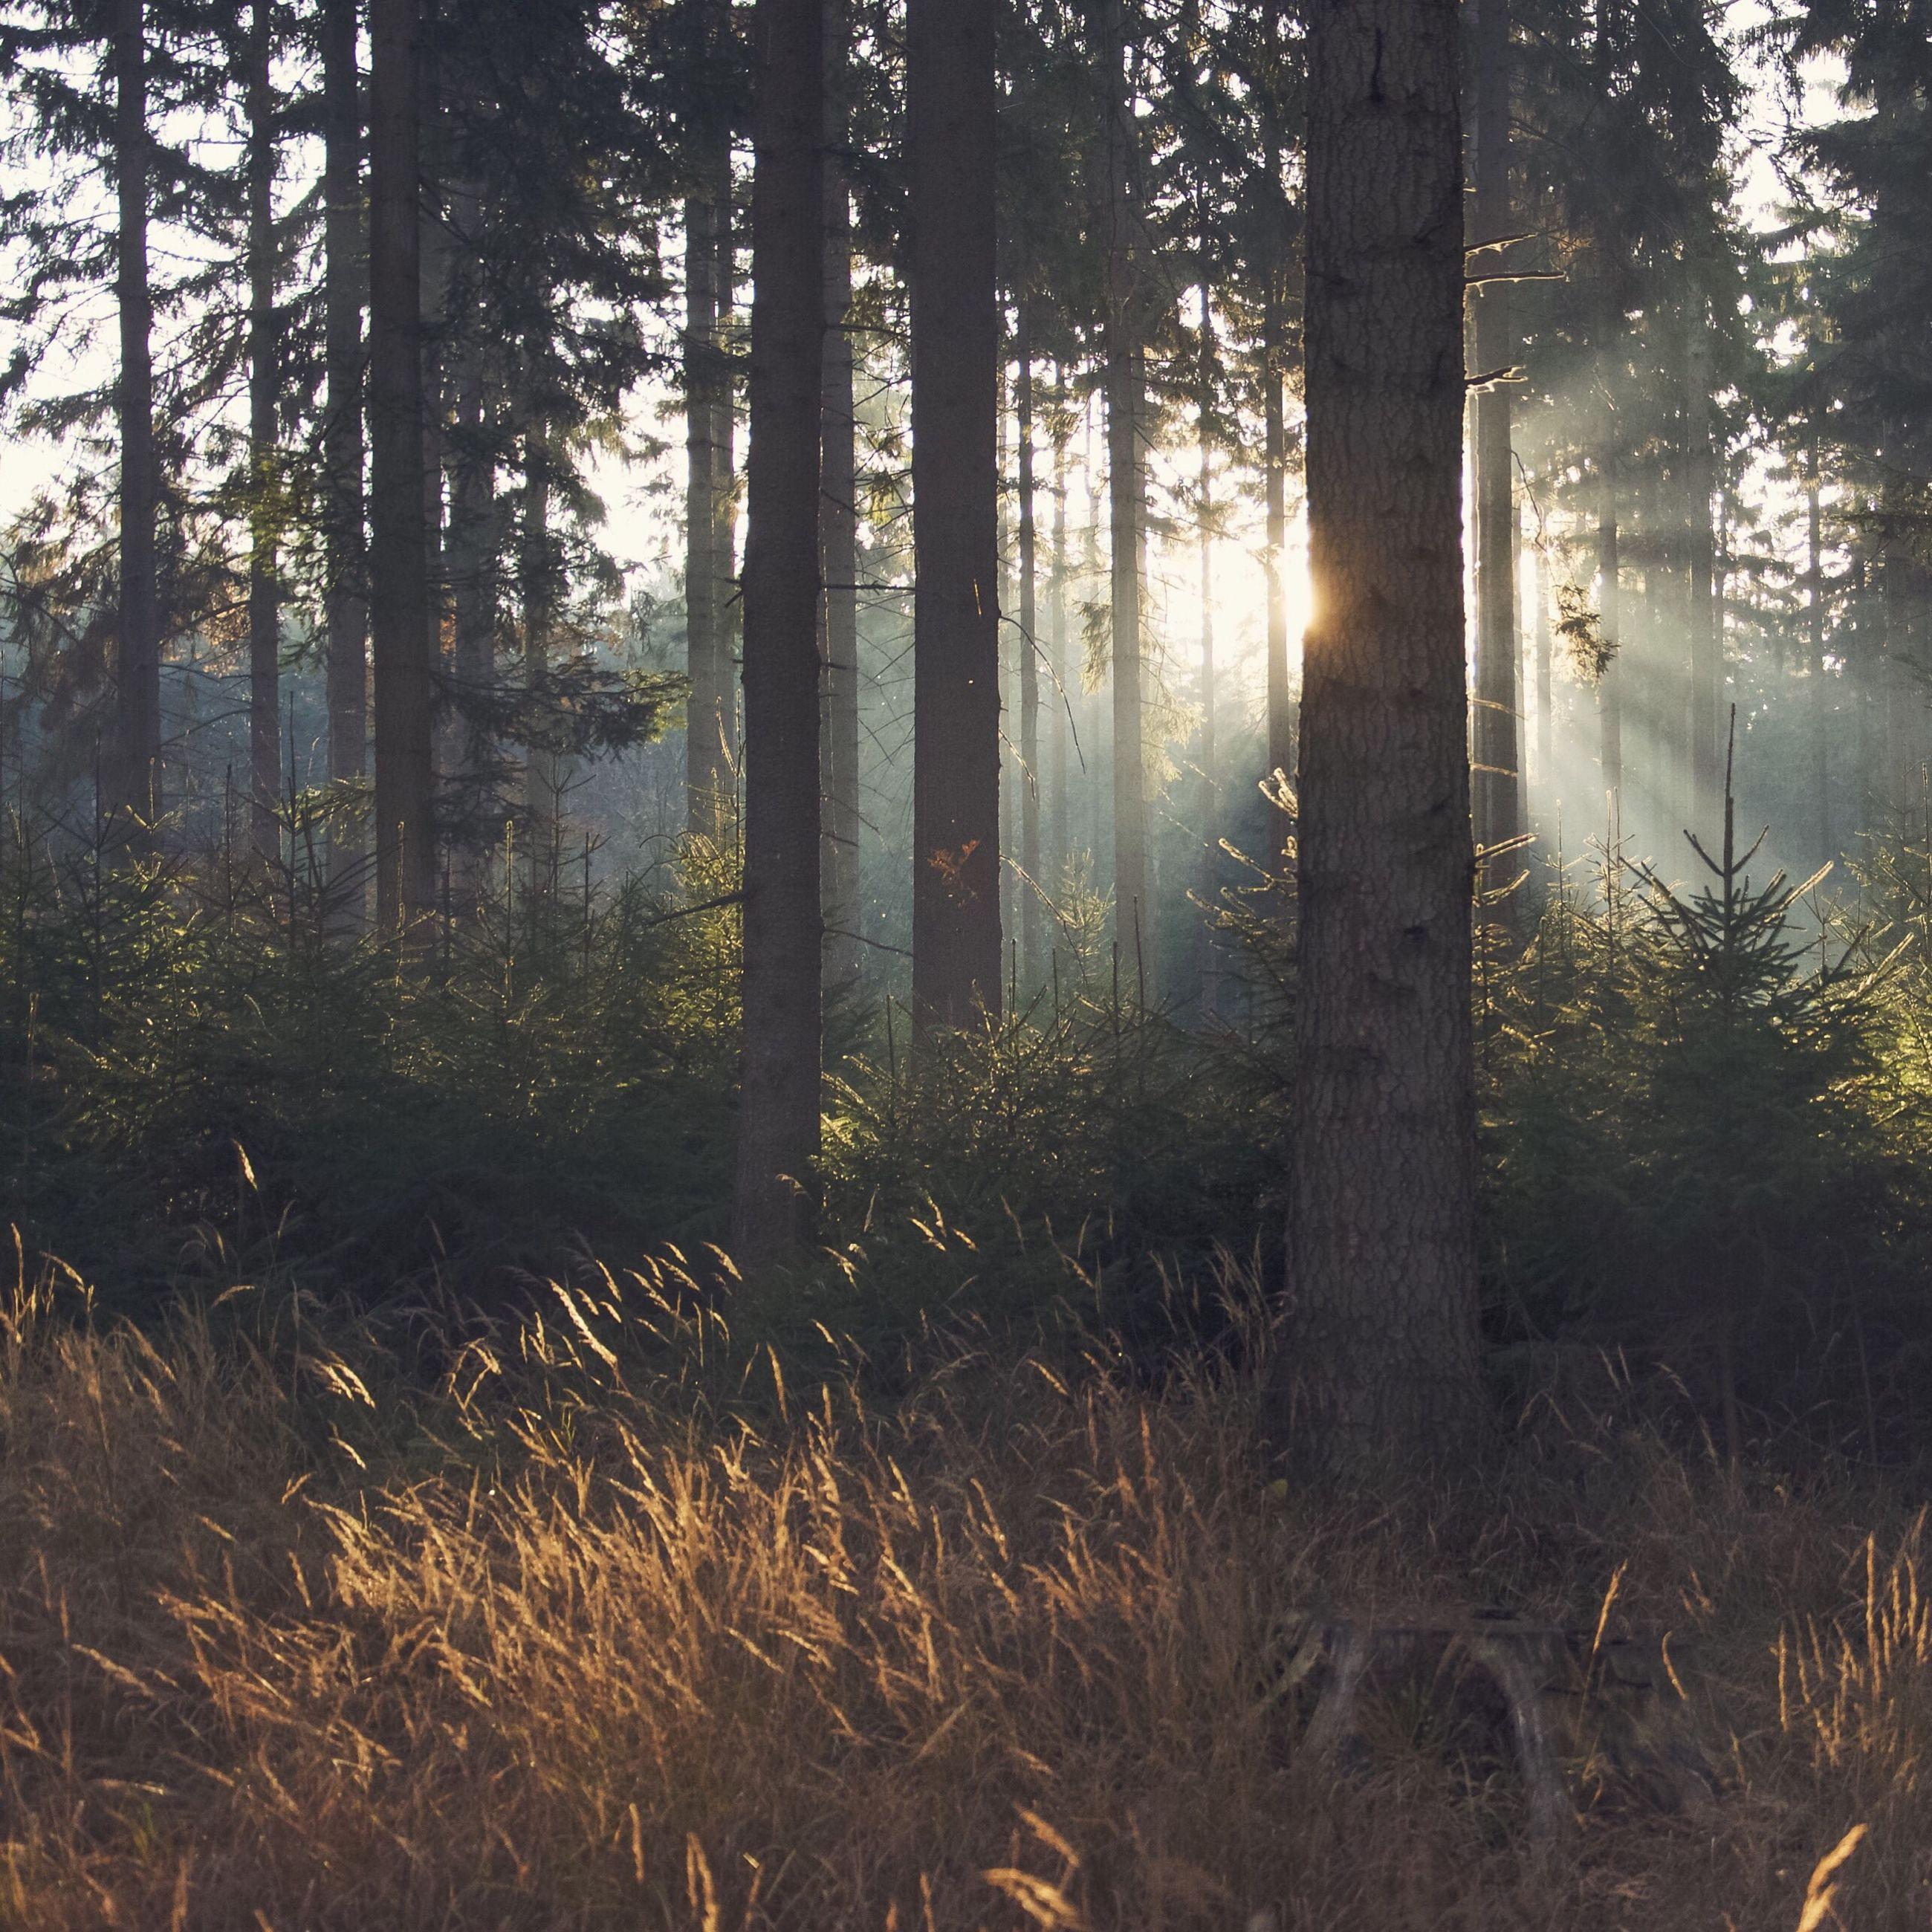 tree, forest, tranquility, tree trunk, tranquil scene, woodland, sun, sunlight, nature, growth, beauty in nature, scenics, sunbeam, landscape, non-urban scene, back lit, lens flare, sunset, idyllic, grass